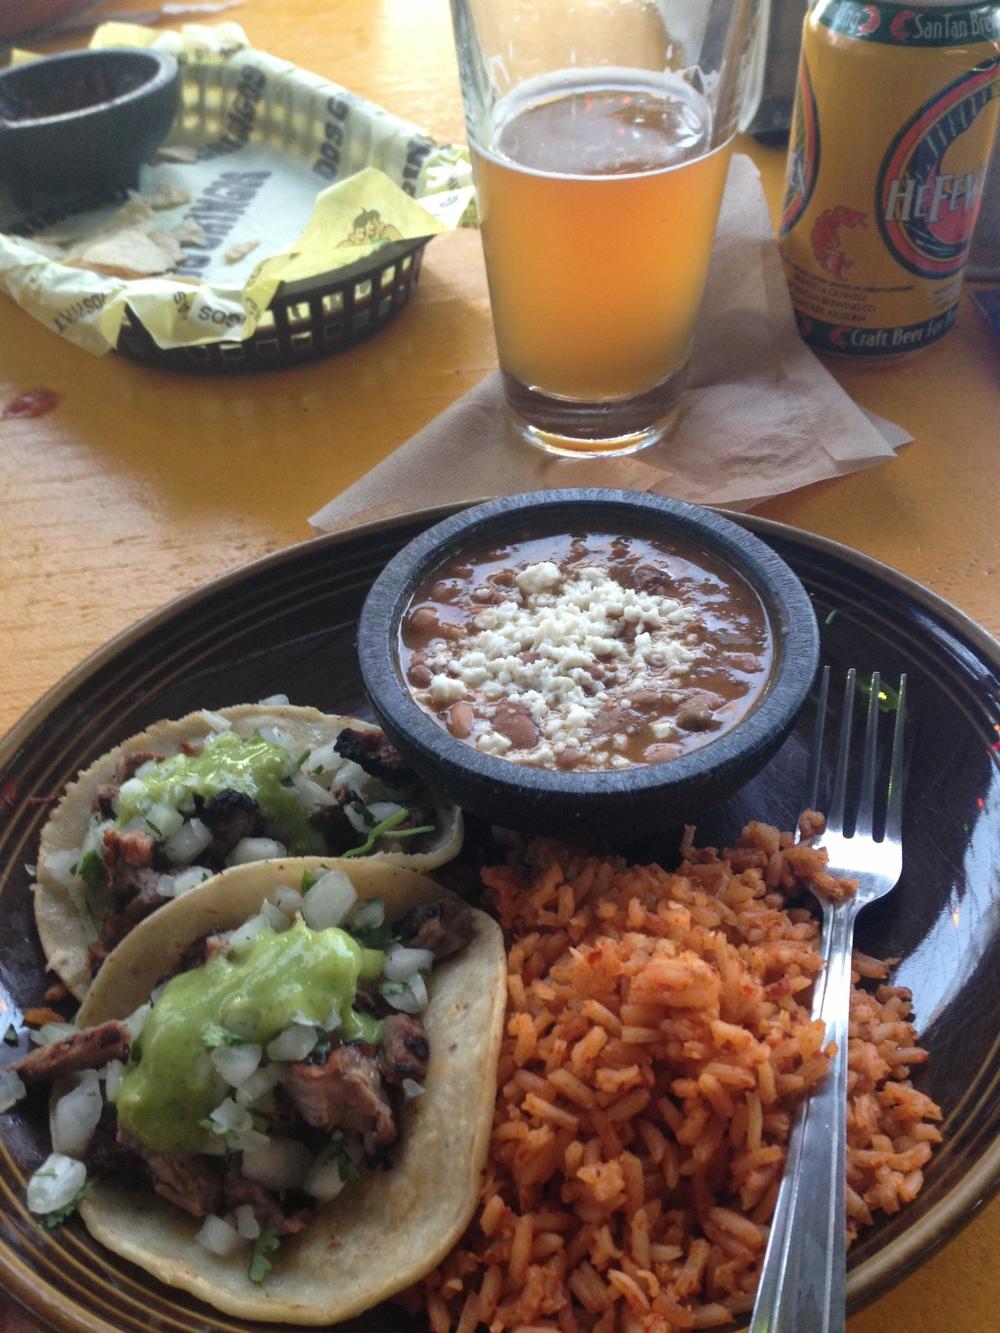 Steak tacos and hefeweizen